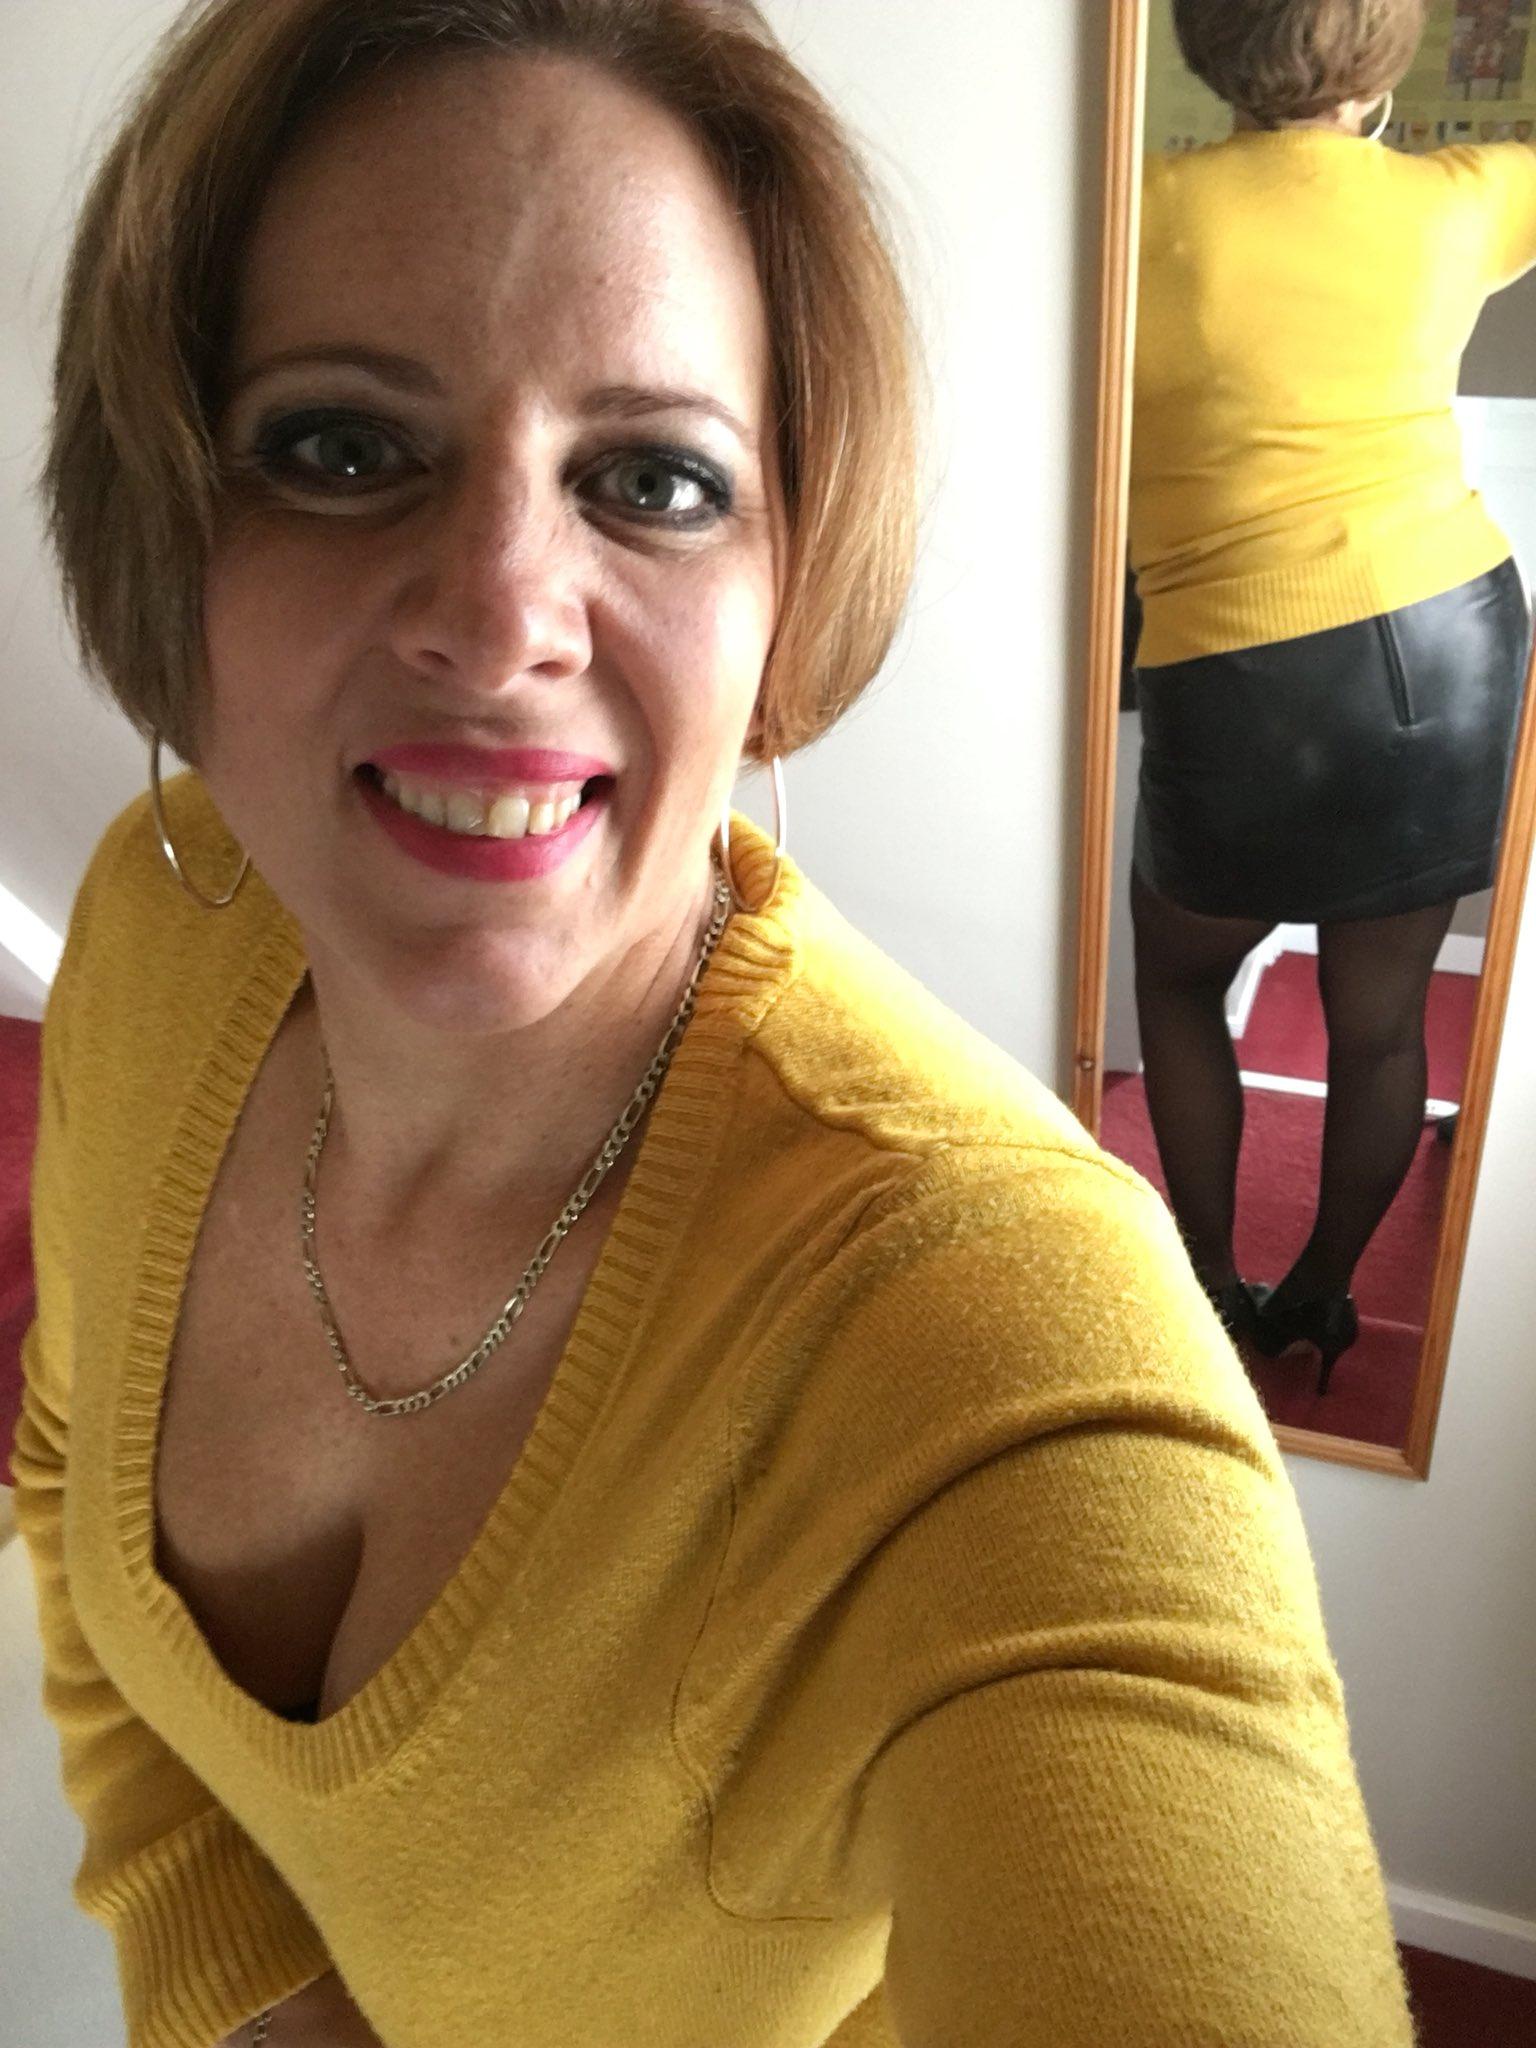 Bbw curvy claire stockings